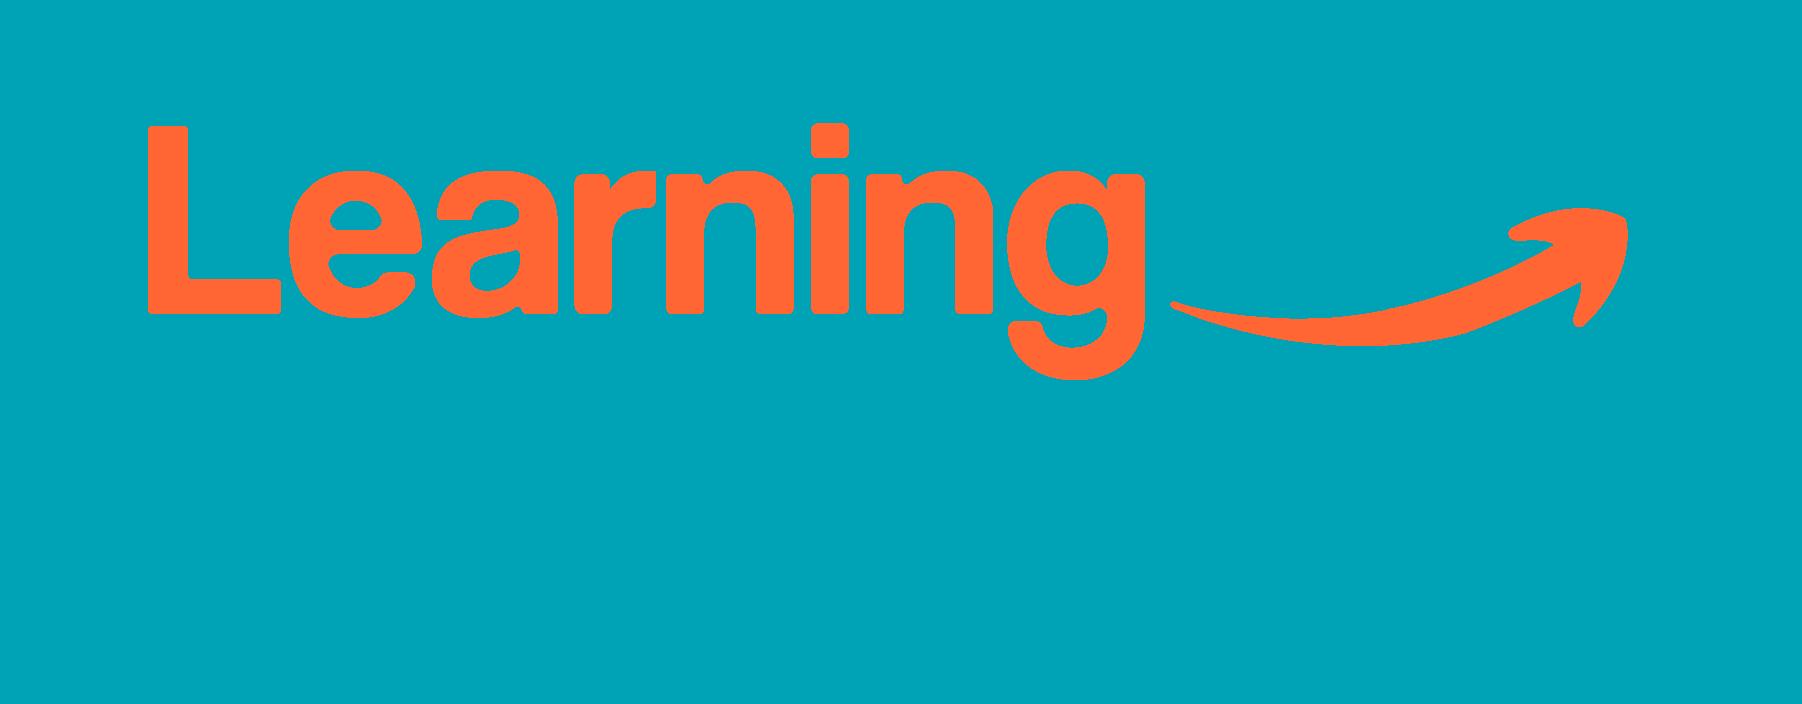 Learning-Performance-final-logo-01